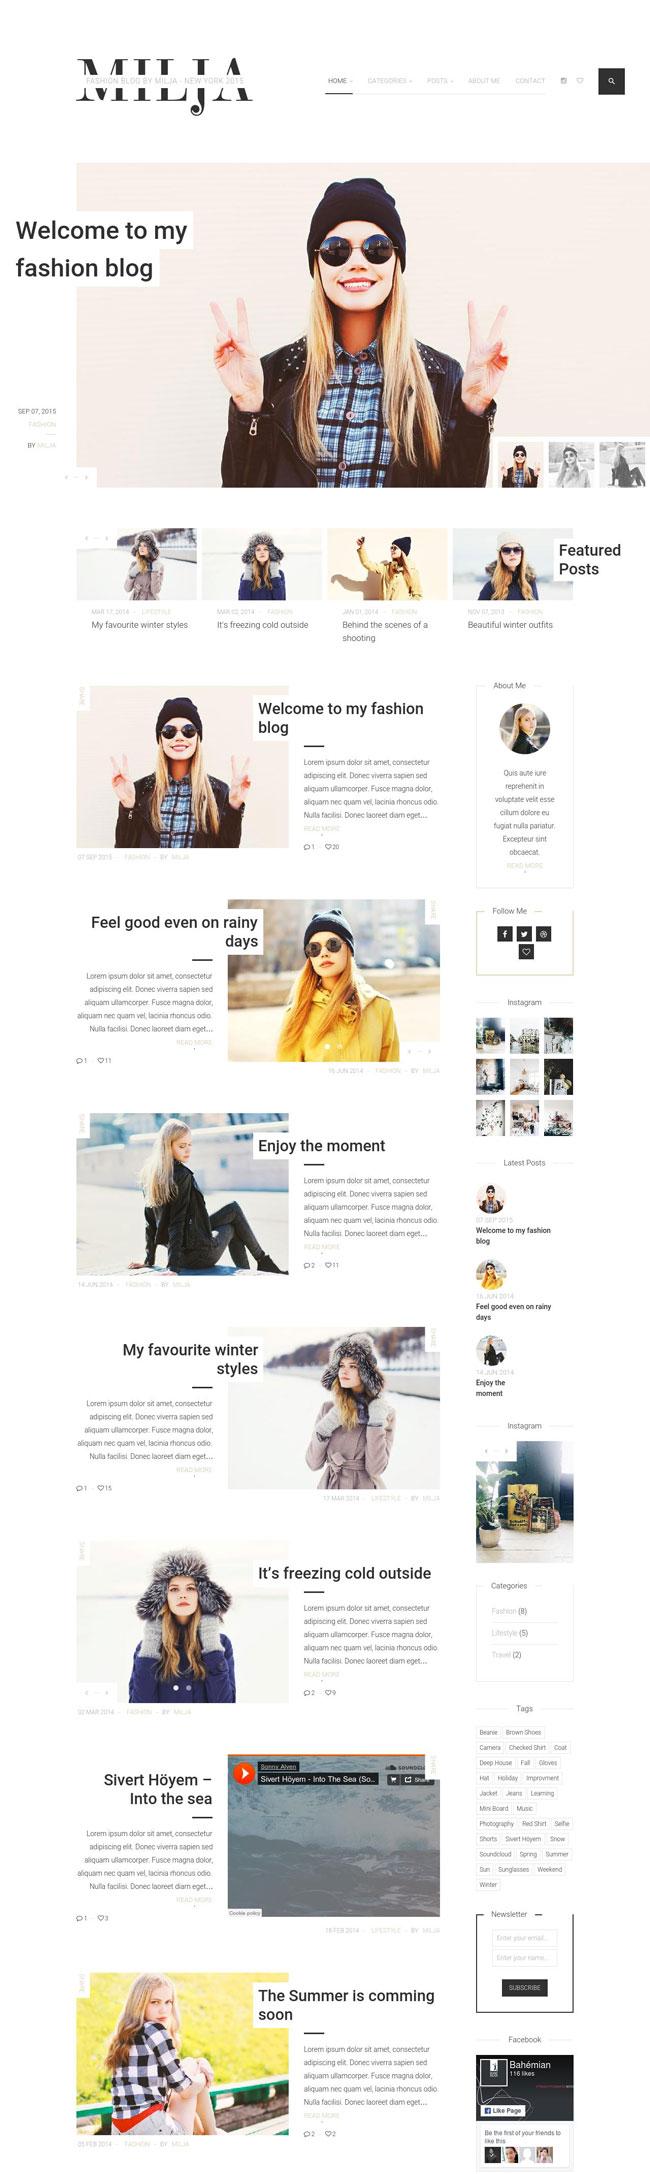 Milja-A-Classy-Personal-WordPress-Blog-Theme